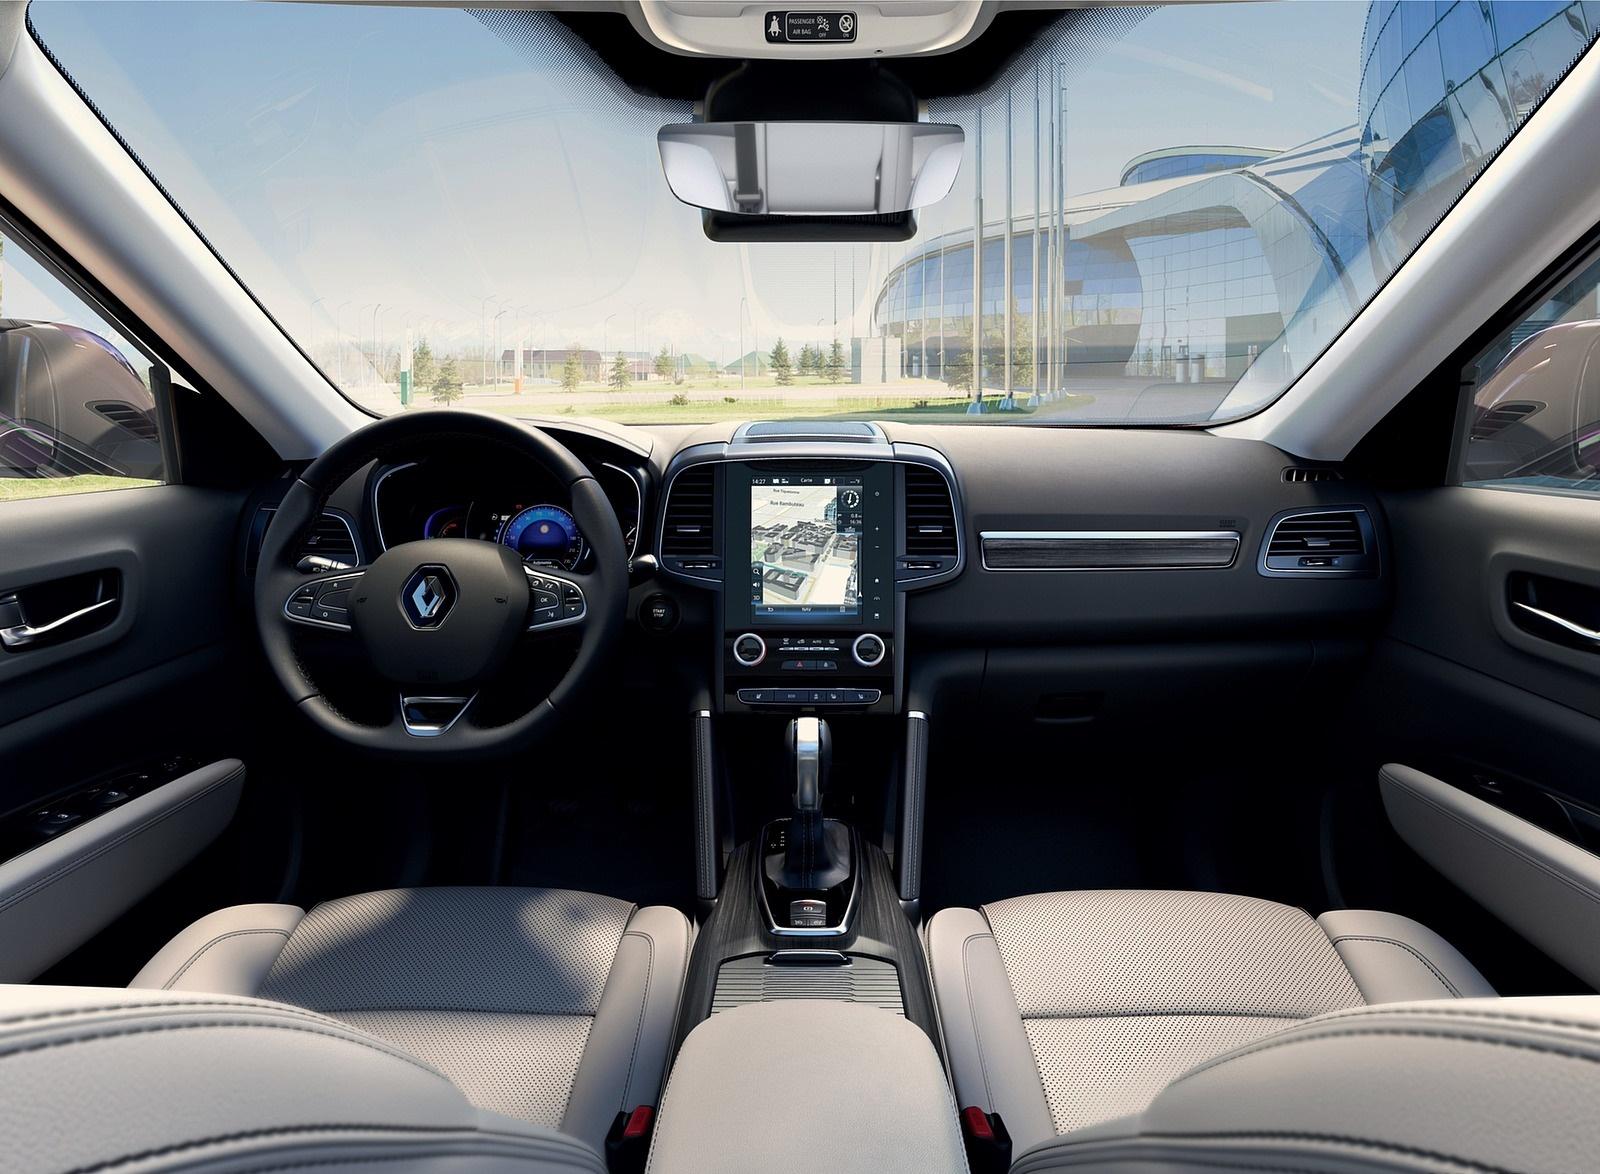 2020 Renault Koleos Interior Cockpit Wallpapers (10)